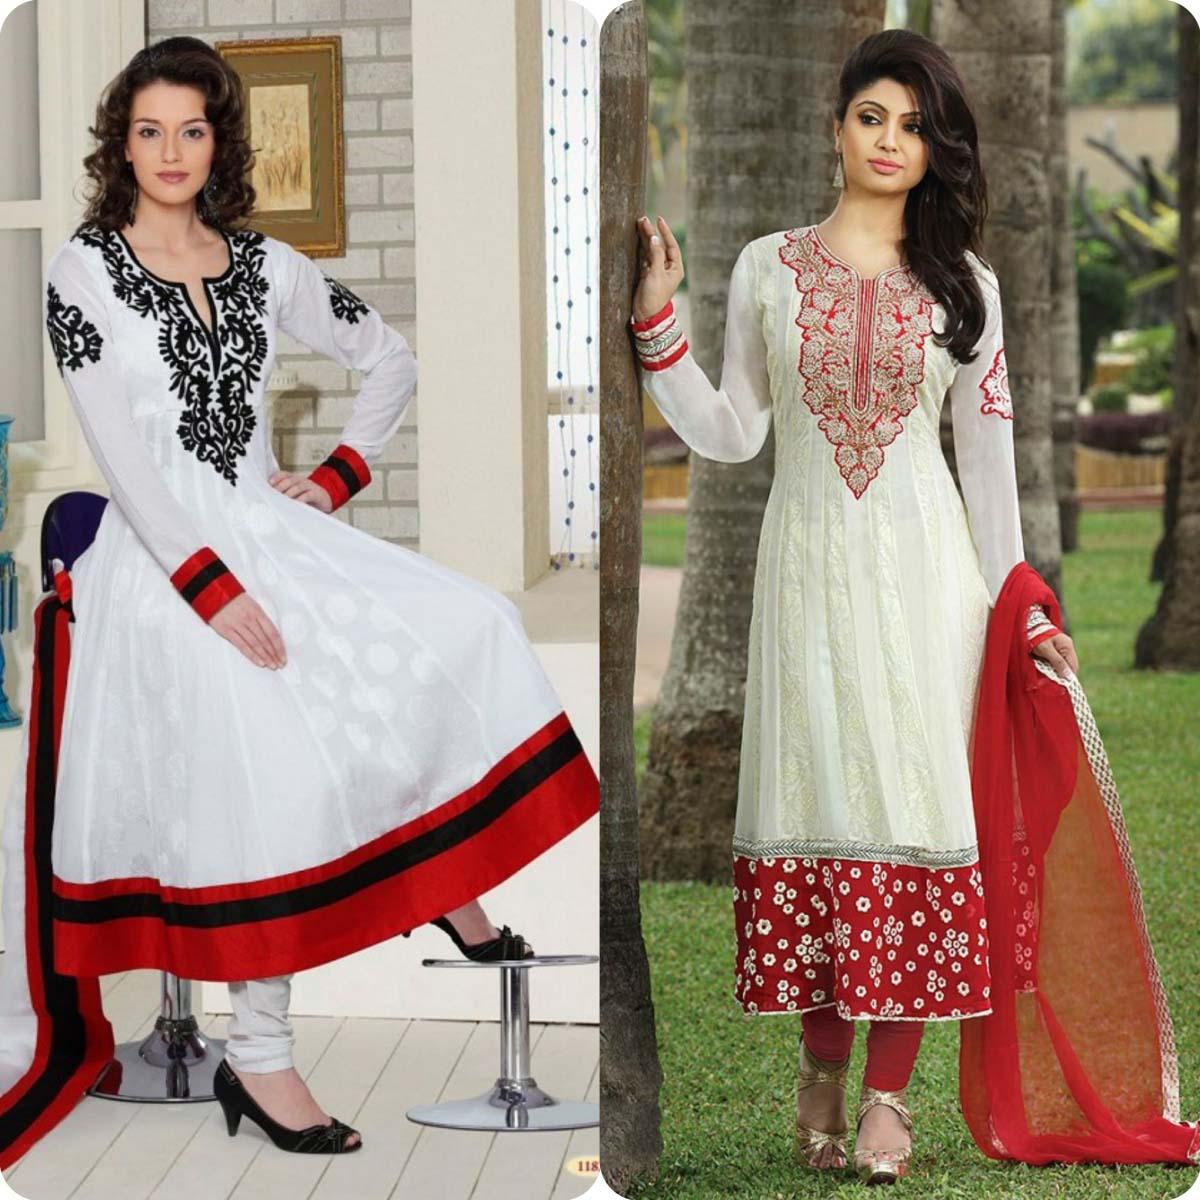 Churidar Neckline Designs for Women Dresses